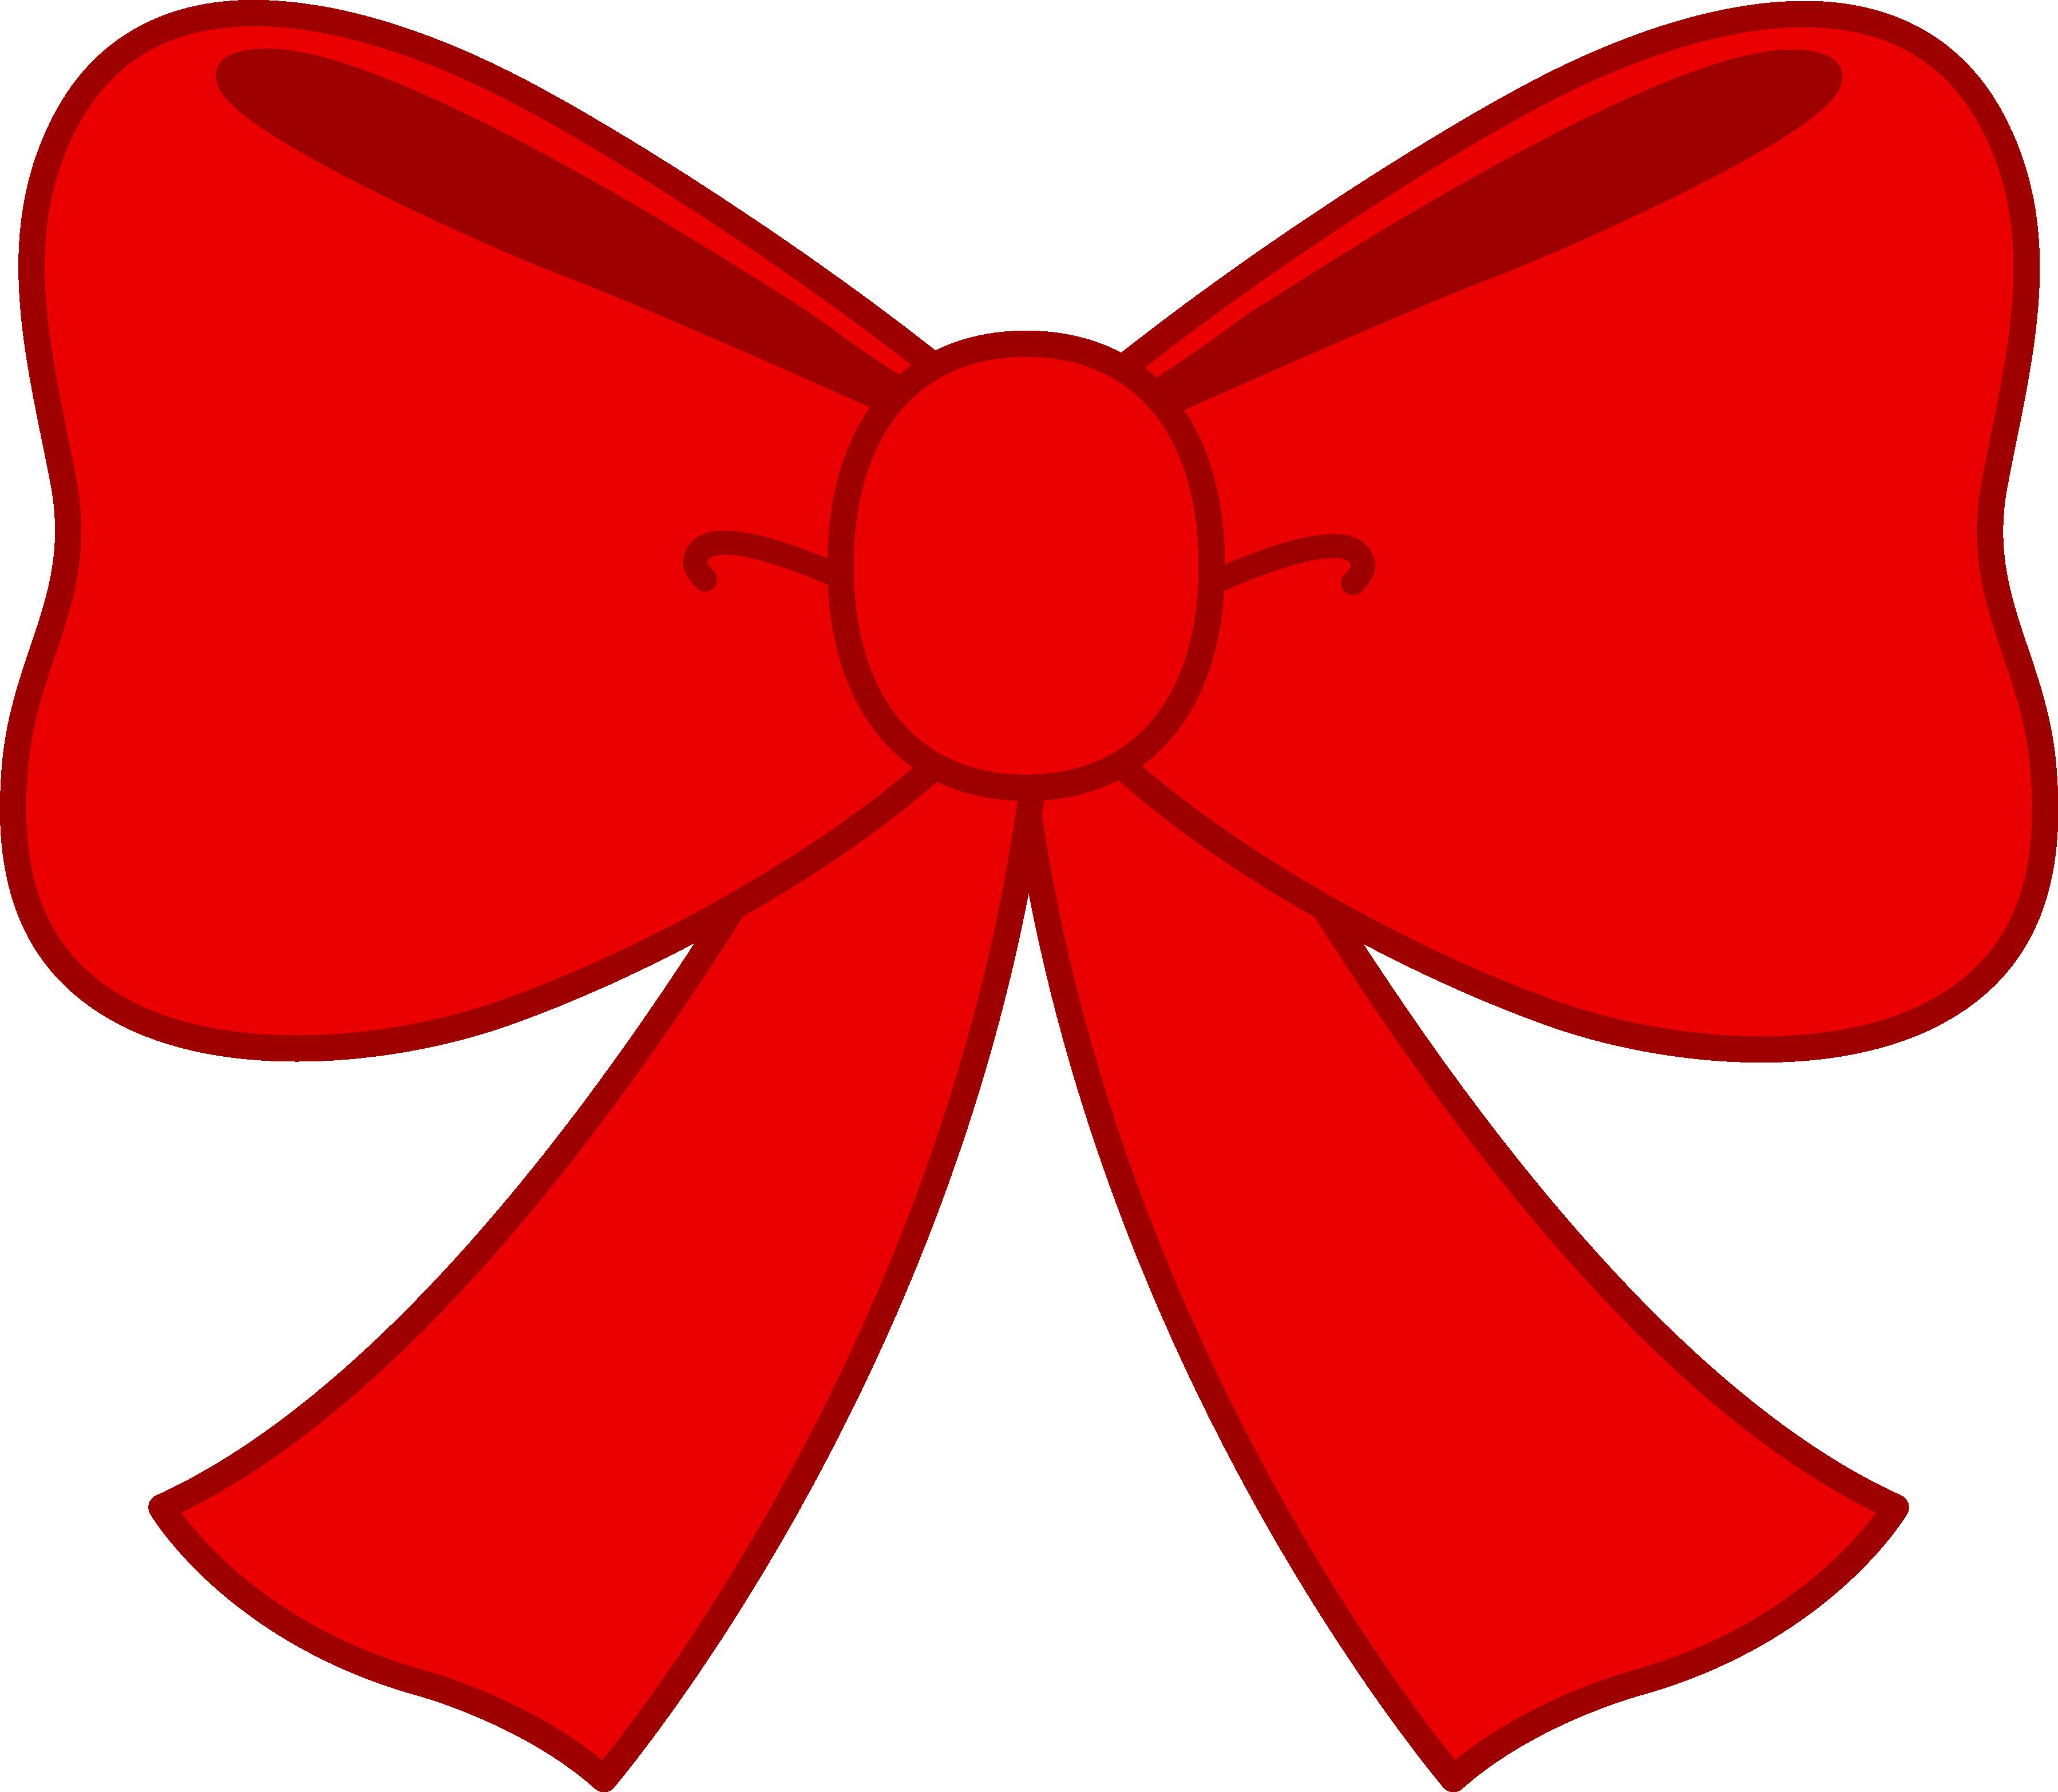 Ribbon clipart free clipart images-Ribbon clipart free clipart images-10